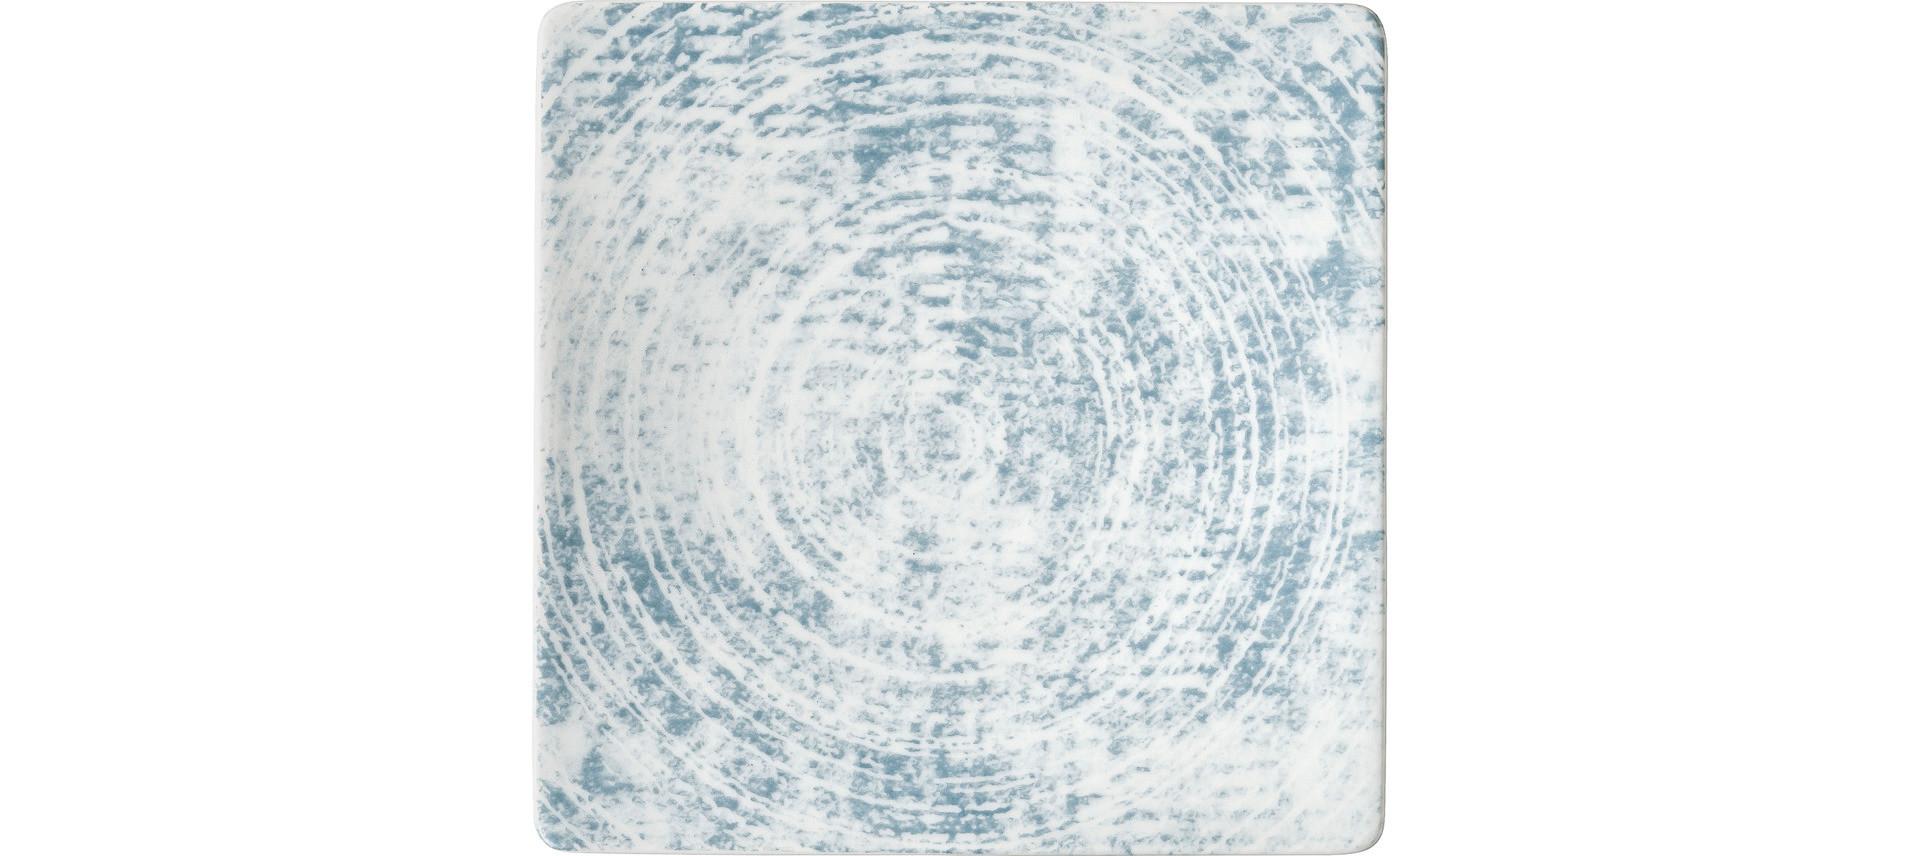 Shabby Chic, Coupteller halbtief eckig 166 x 166 mm Dekor 3